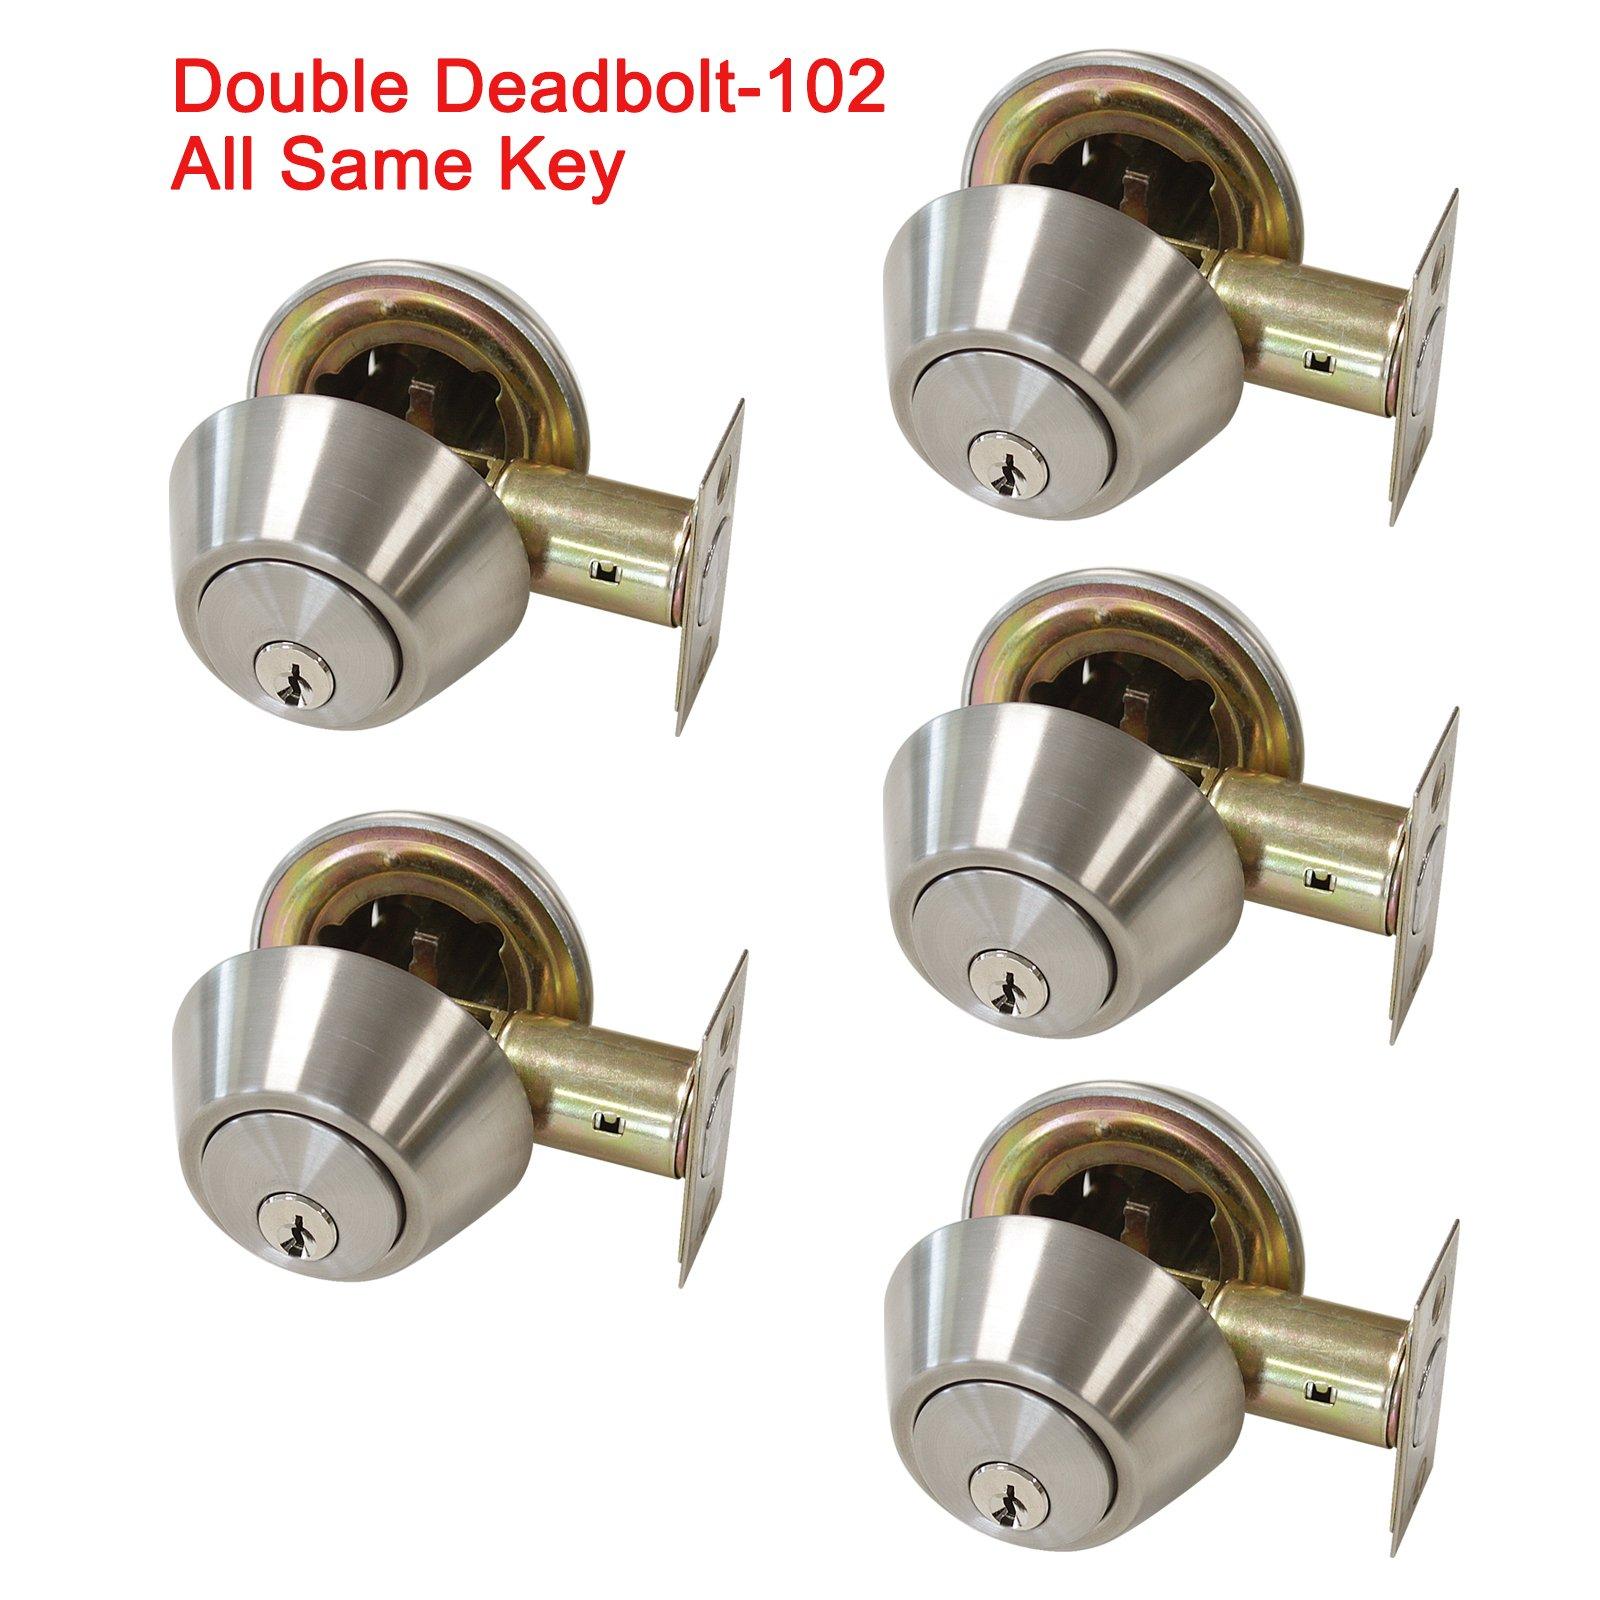 5 Pack Probrico Interior Bedroom Double Cylinder Deadbolt One Keyway Keyed Alike Same Key Safety Bolt Door Lock Lockset in Satin Nickel-Double Deadbolt-102